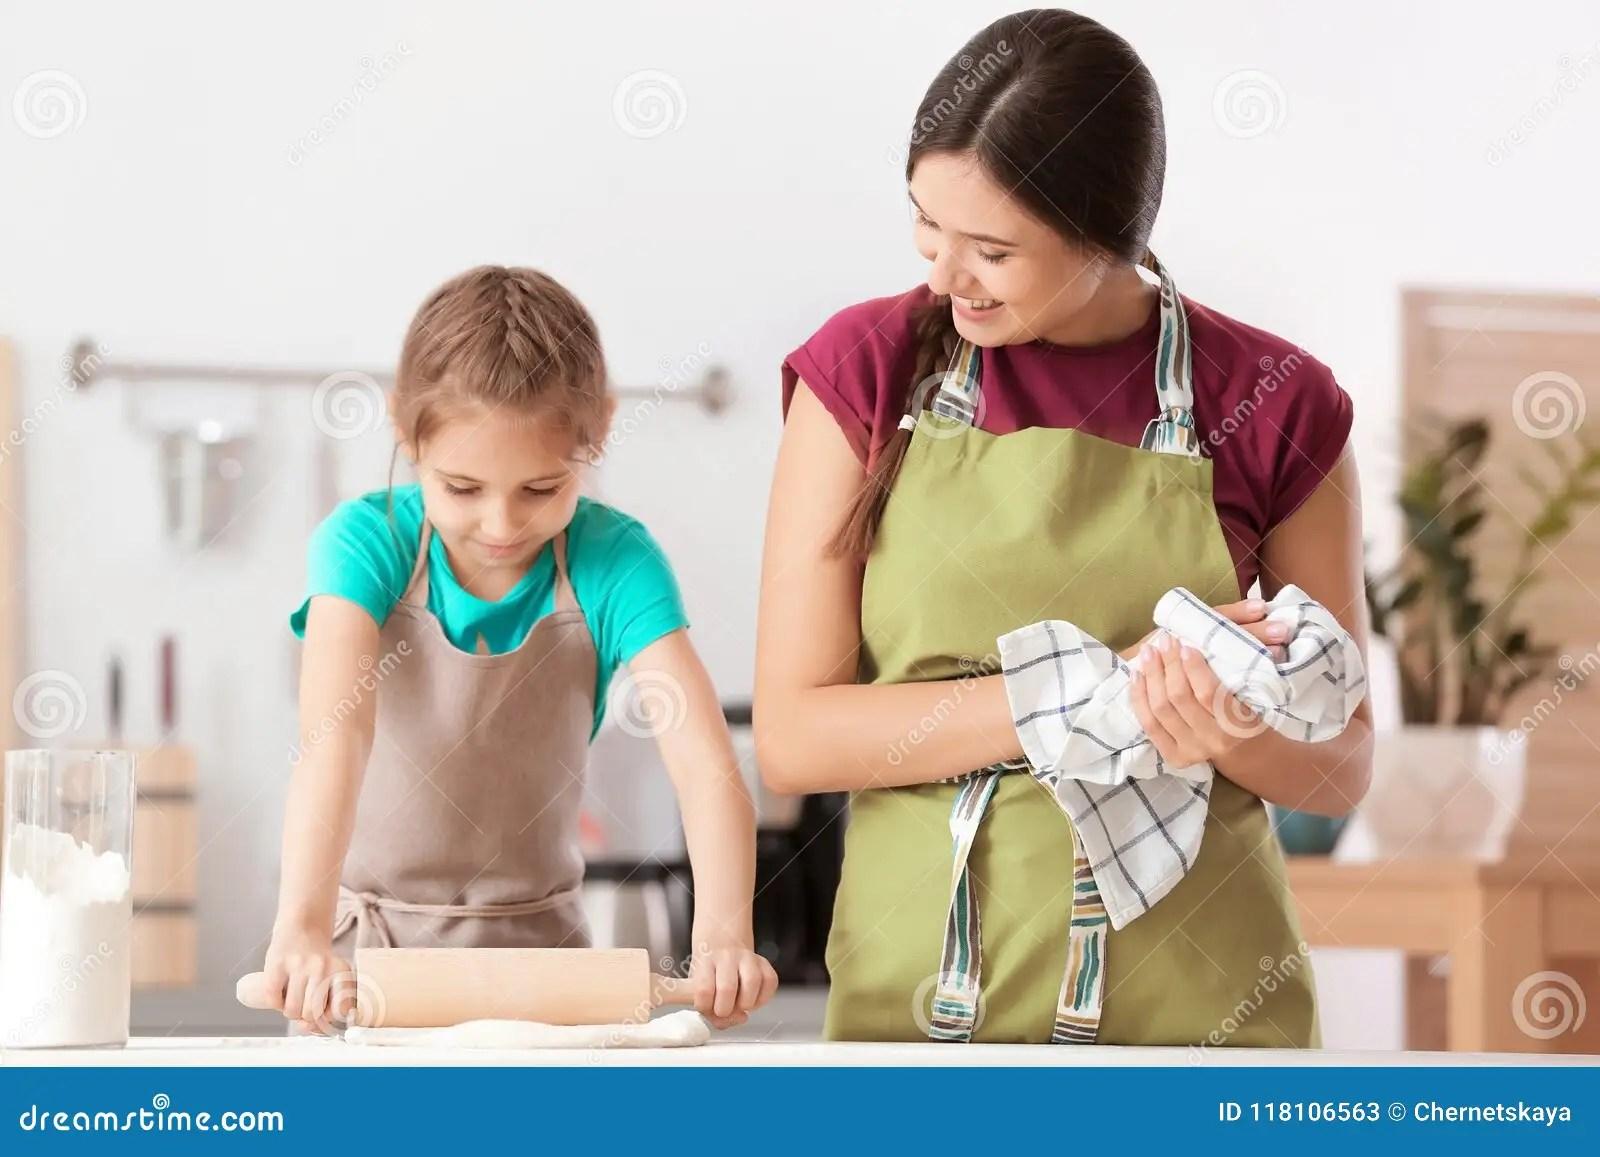 kitchen prep table pendant lighting over island 在厨房里照顾和她的准备面团的女儿在桌上库存图片 图片包括有系列 有 在厨房里照顾和她准备面团的逗人喜爱的女儿在桌上